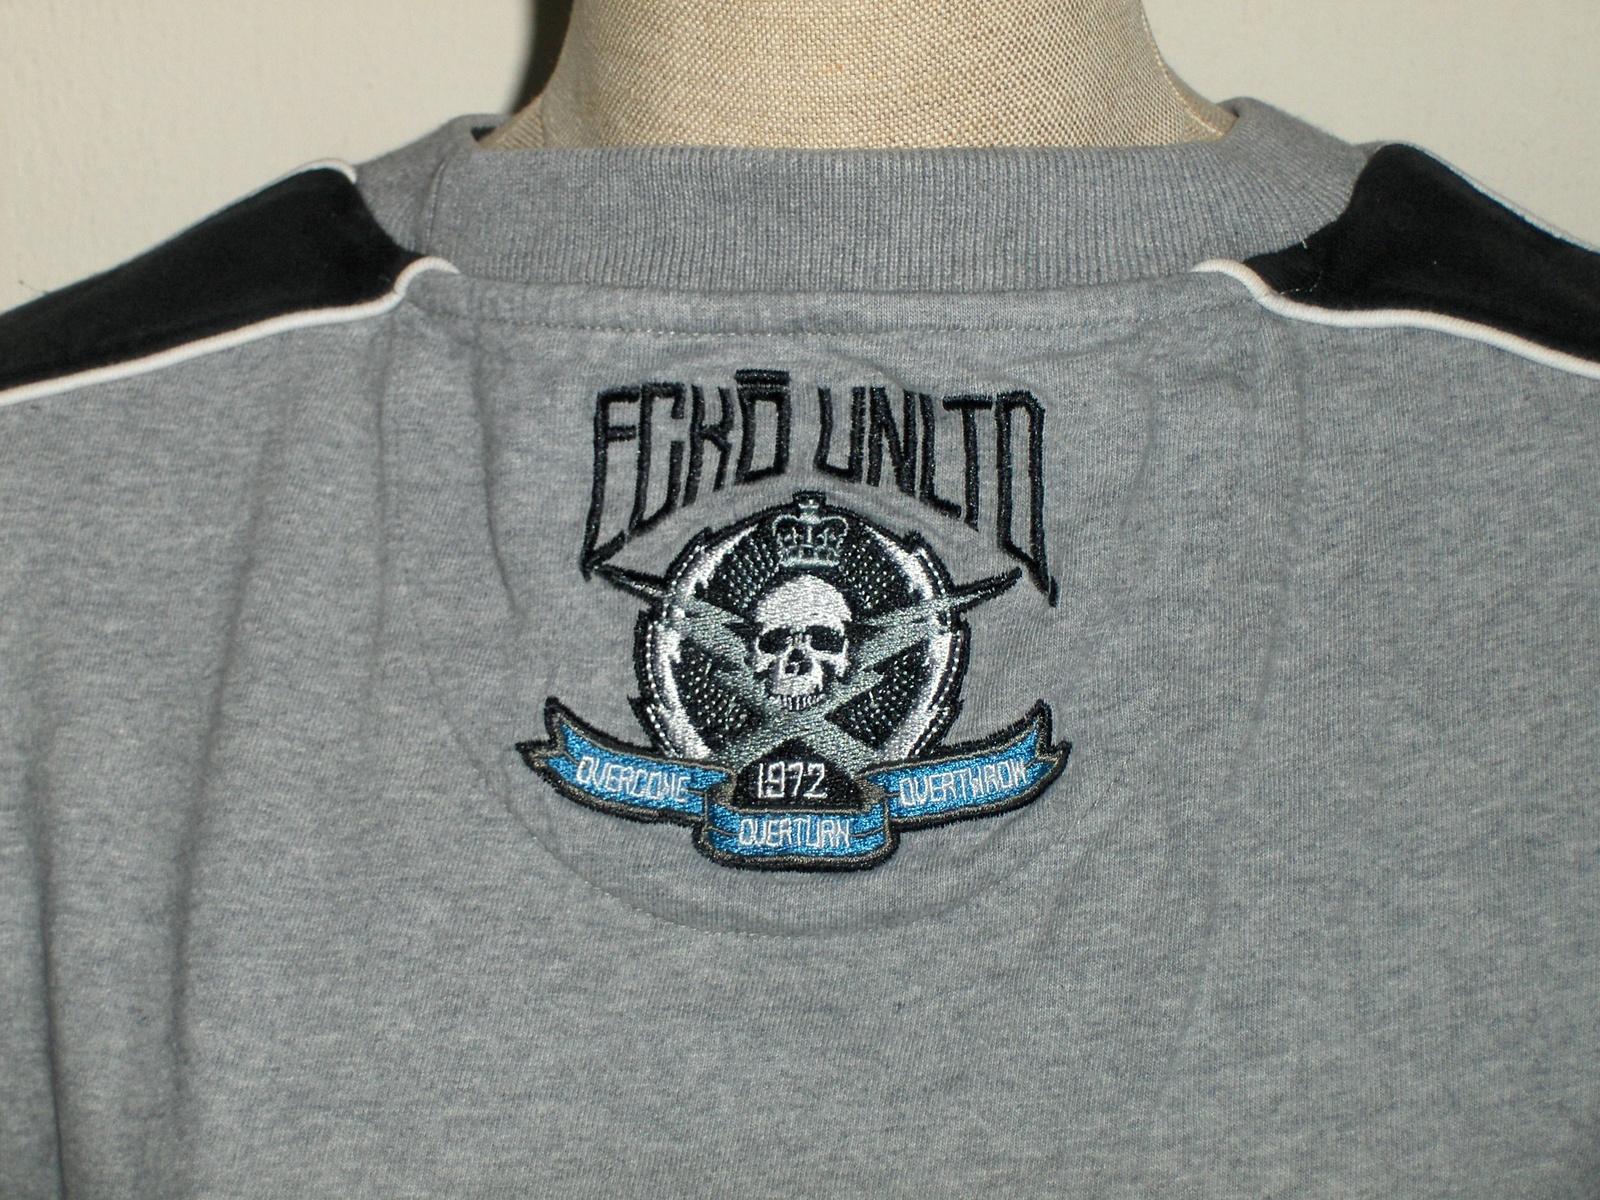 ... ECKO UNLTD T-Shirt Overcome Overturn Overthrow Mens ...